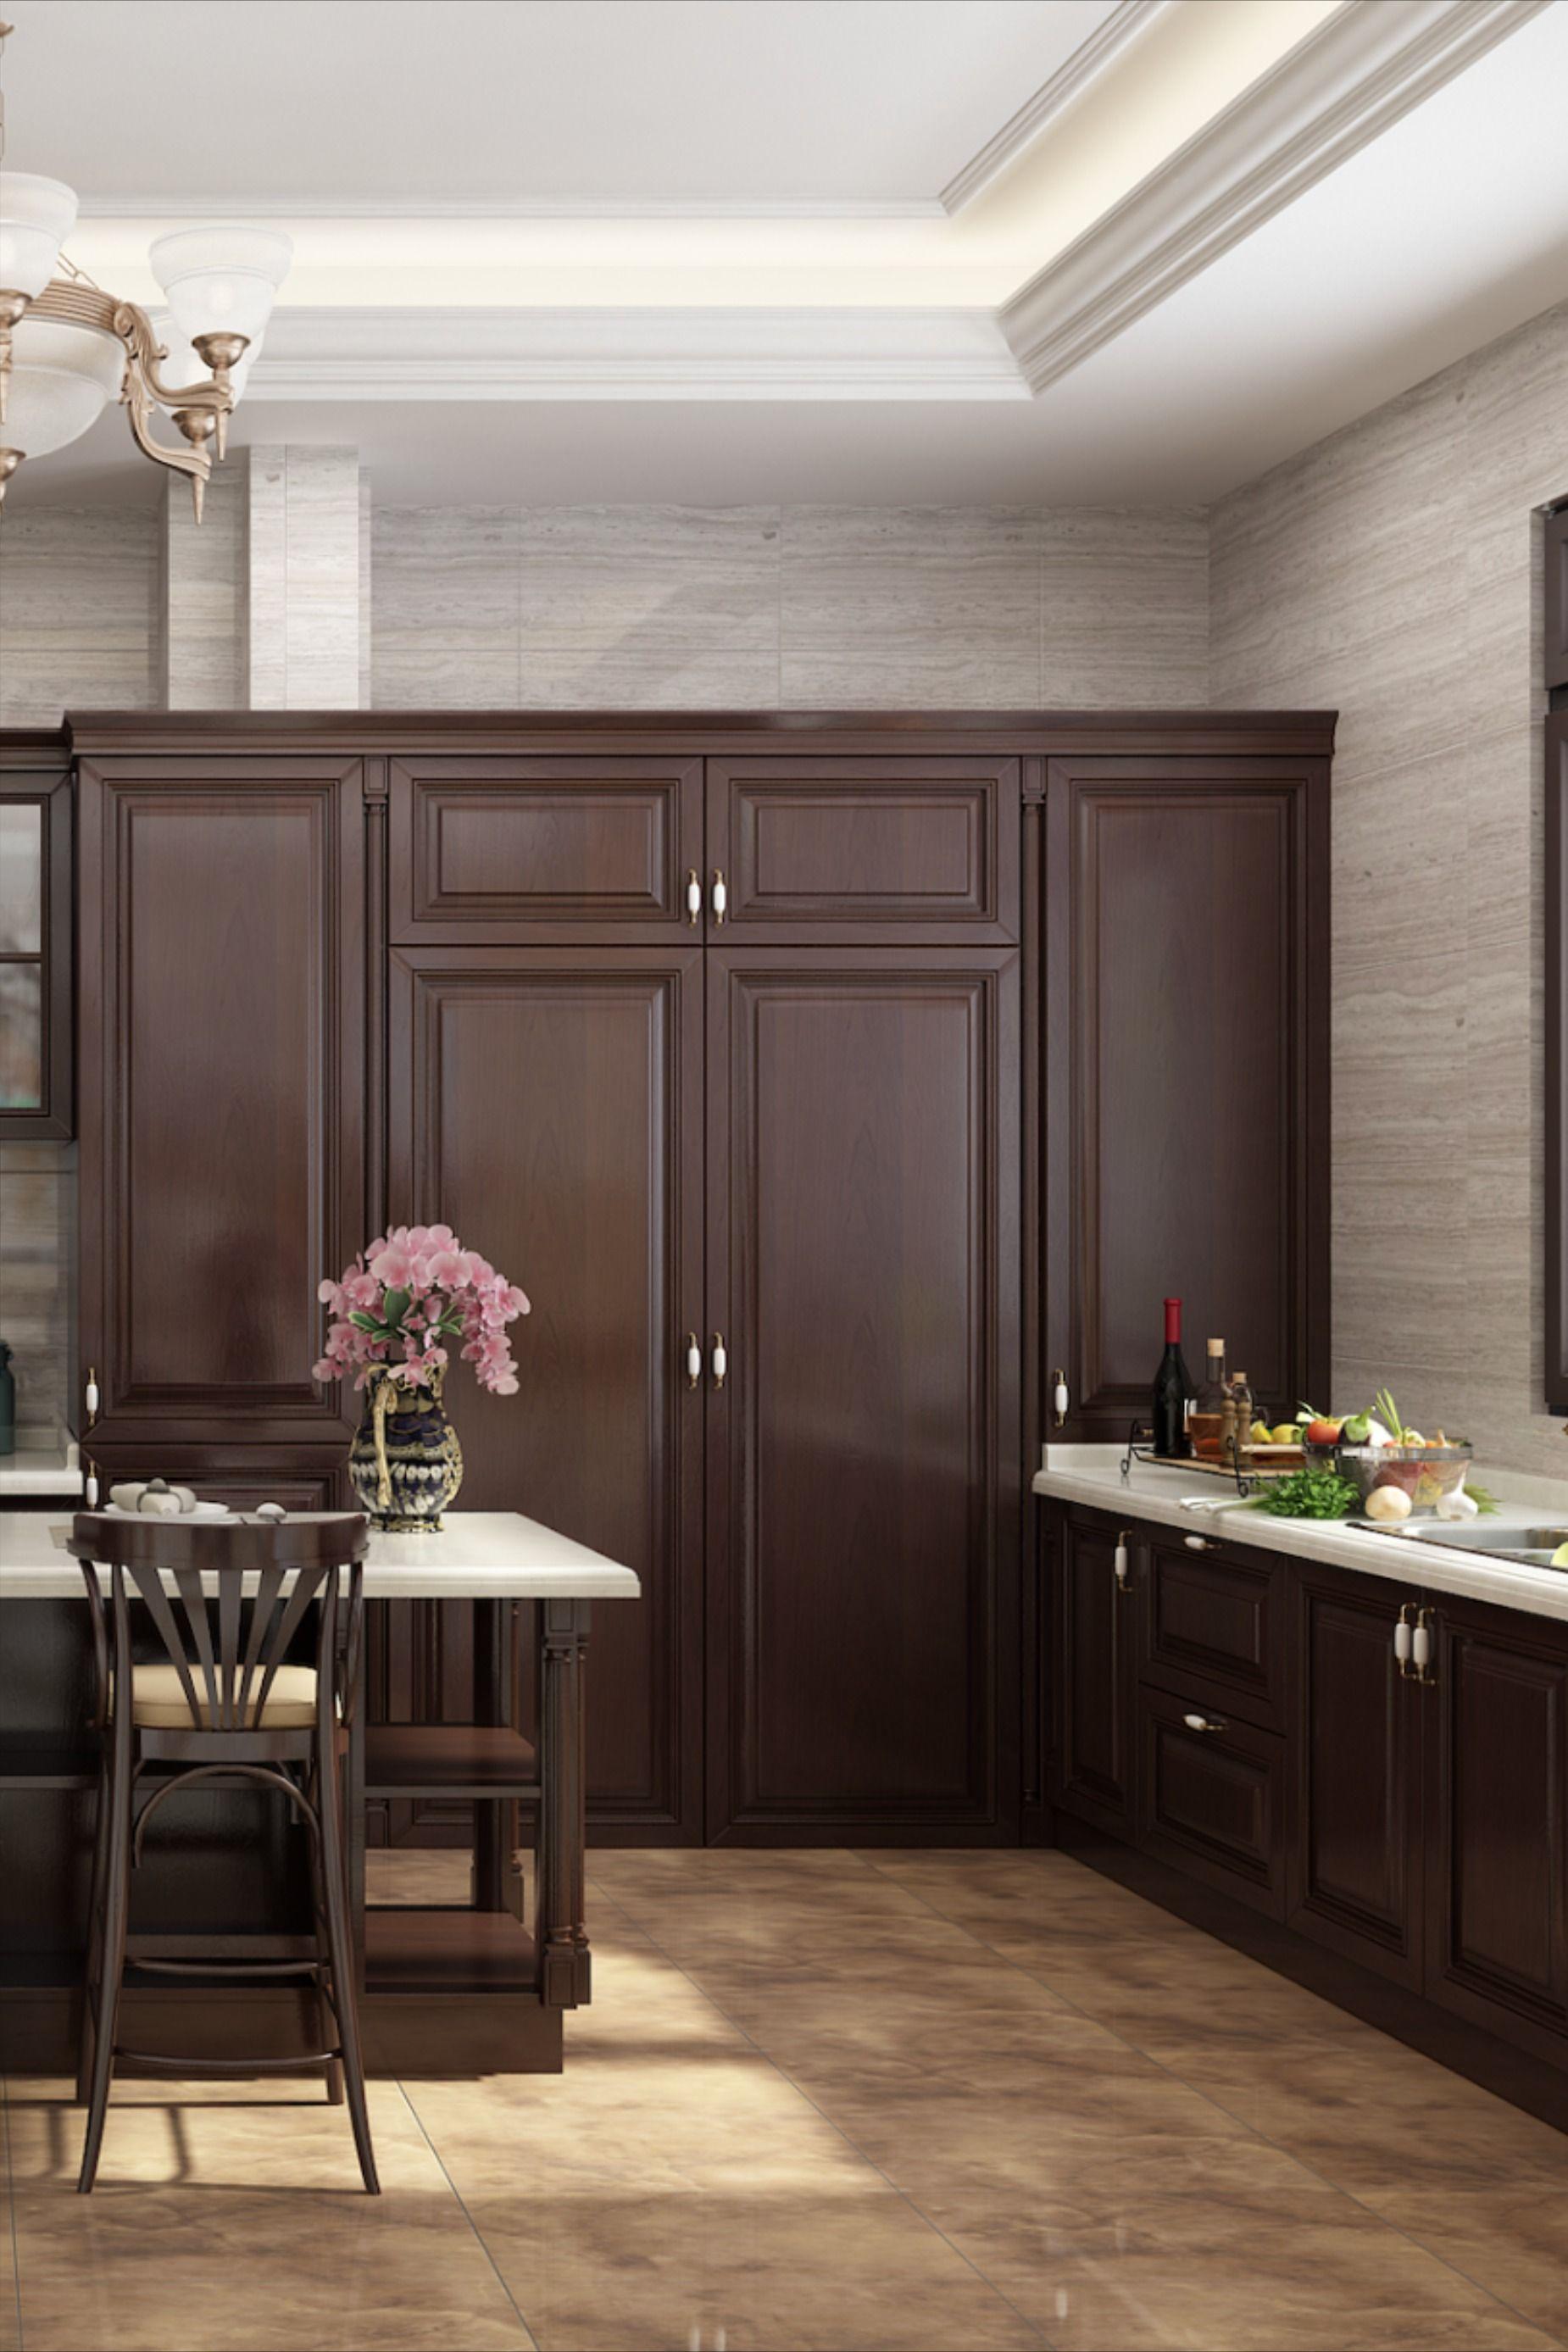 Pvc Blister Kitchen Cabinet Wooden Kitchen Cabinets Kitchen Cabinets Custom Kitchen Cabinets